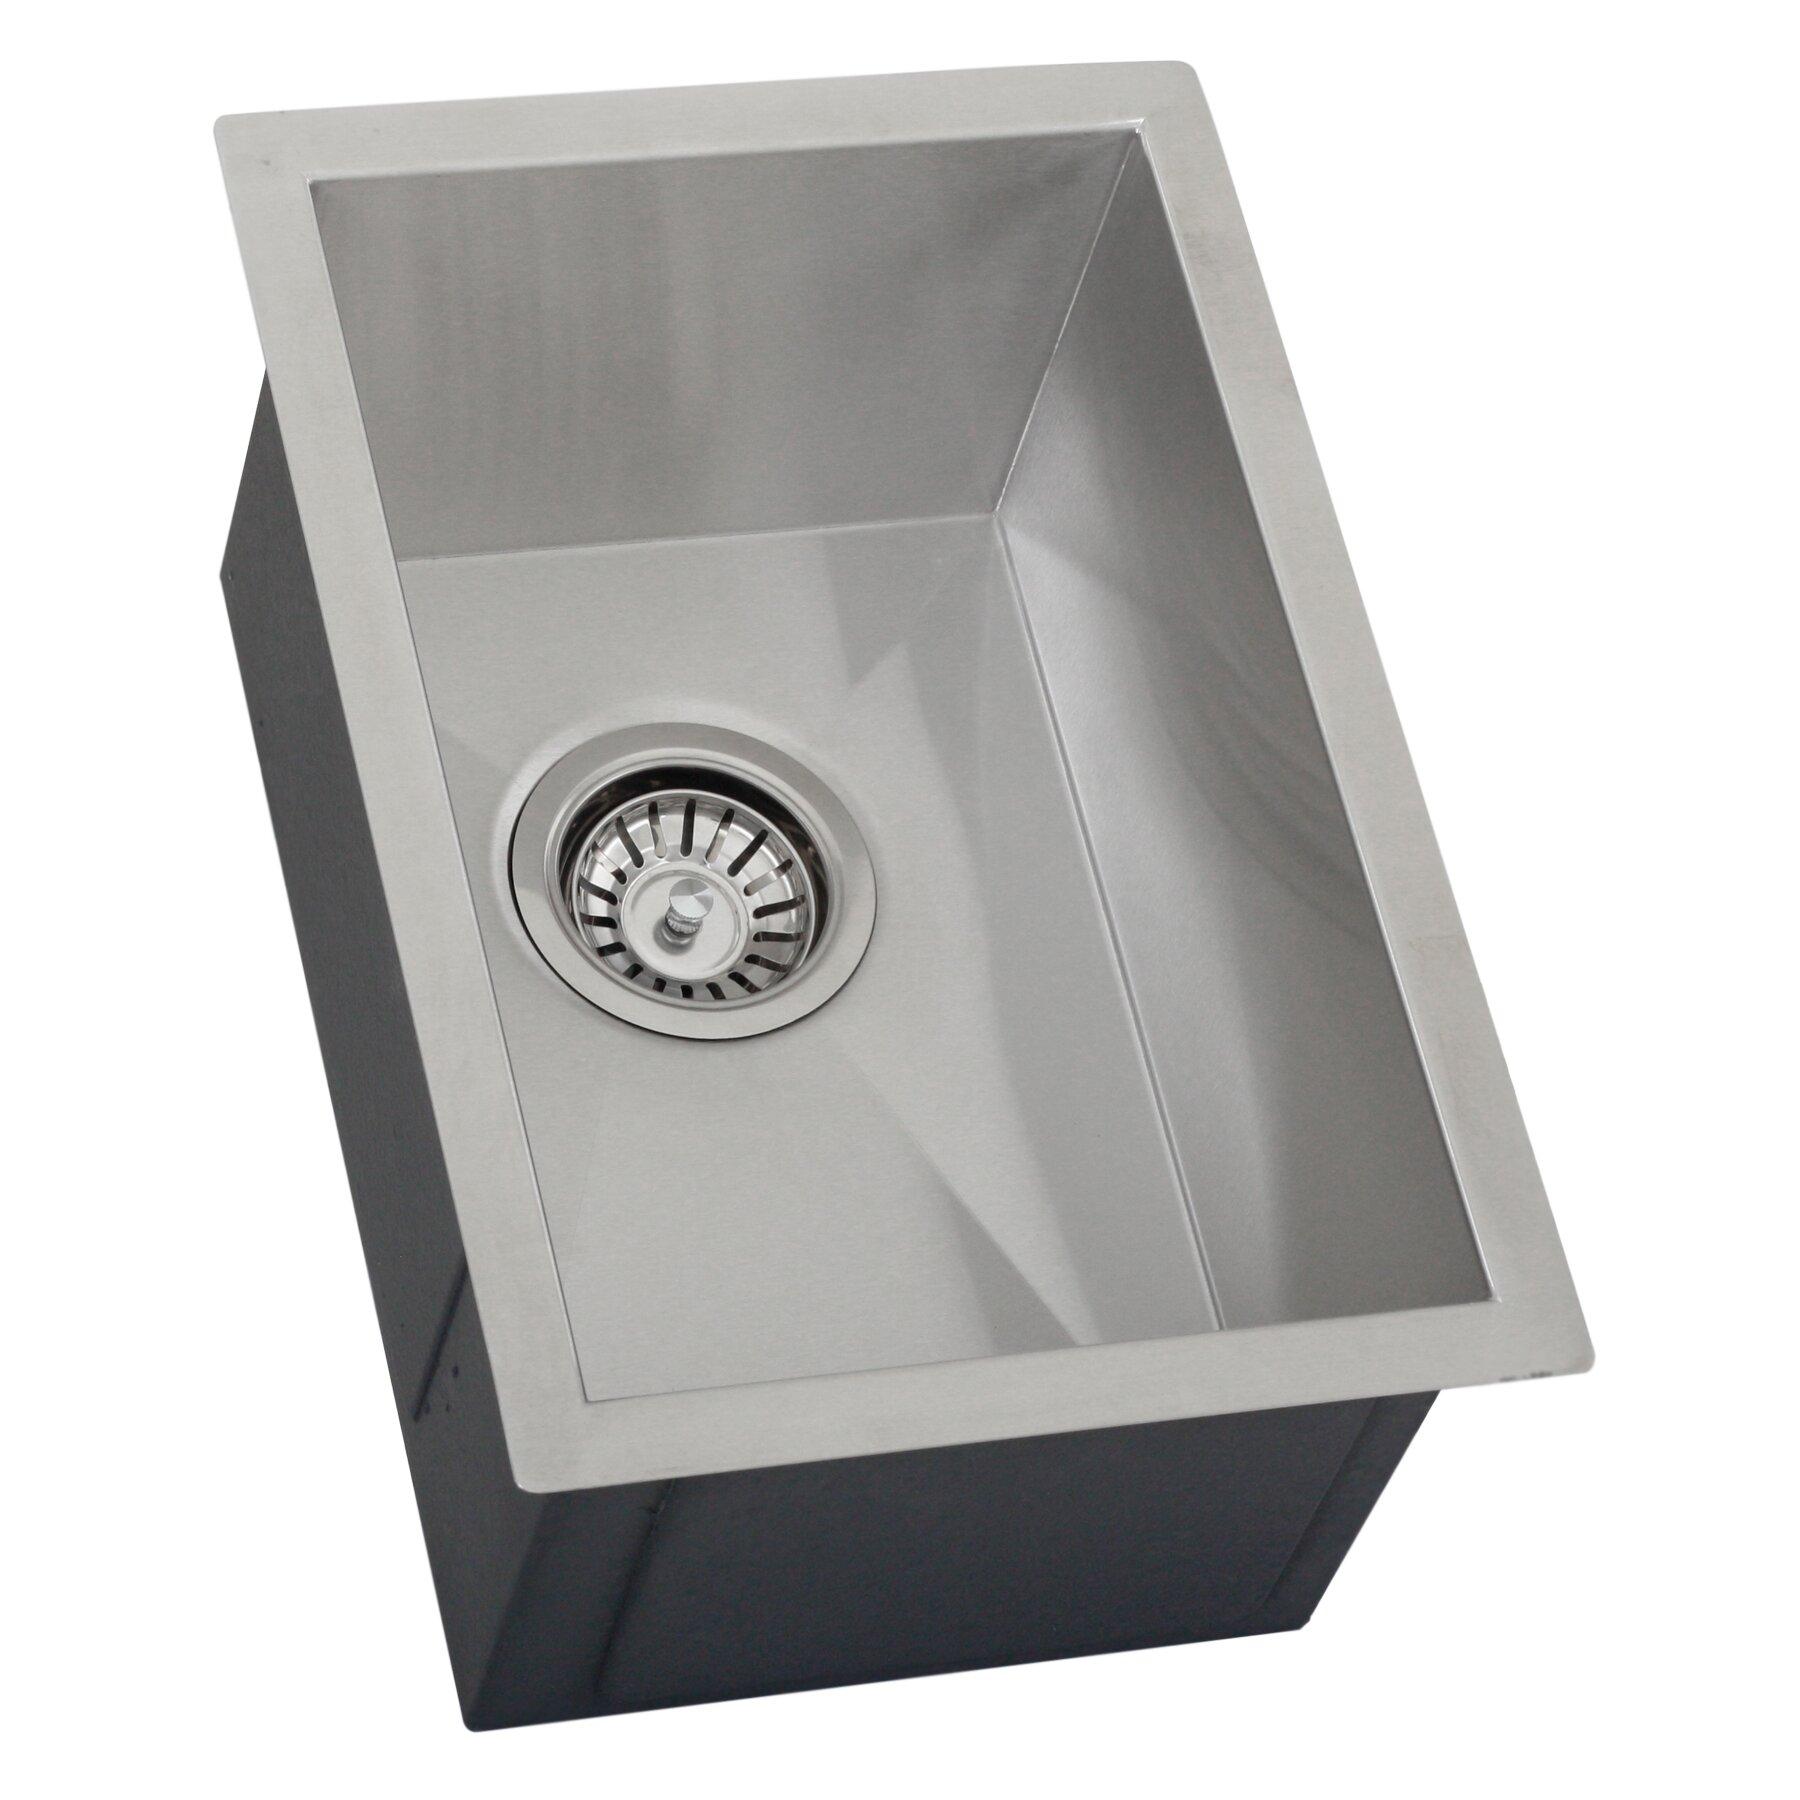 Ticor Sinks Ticor 12